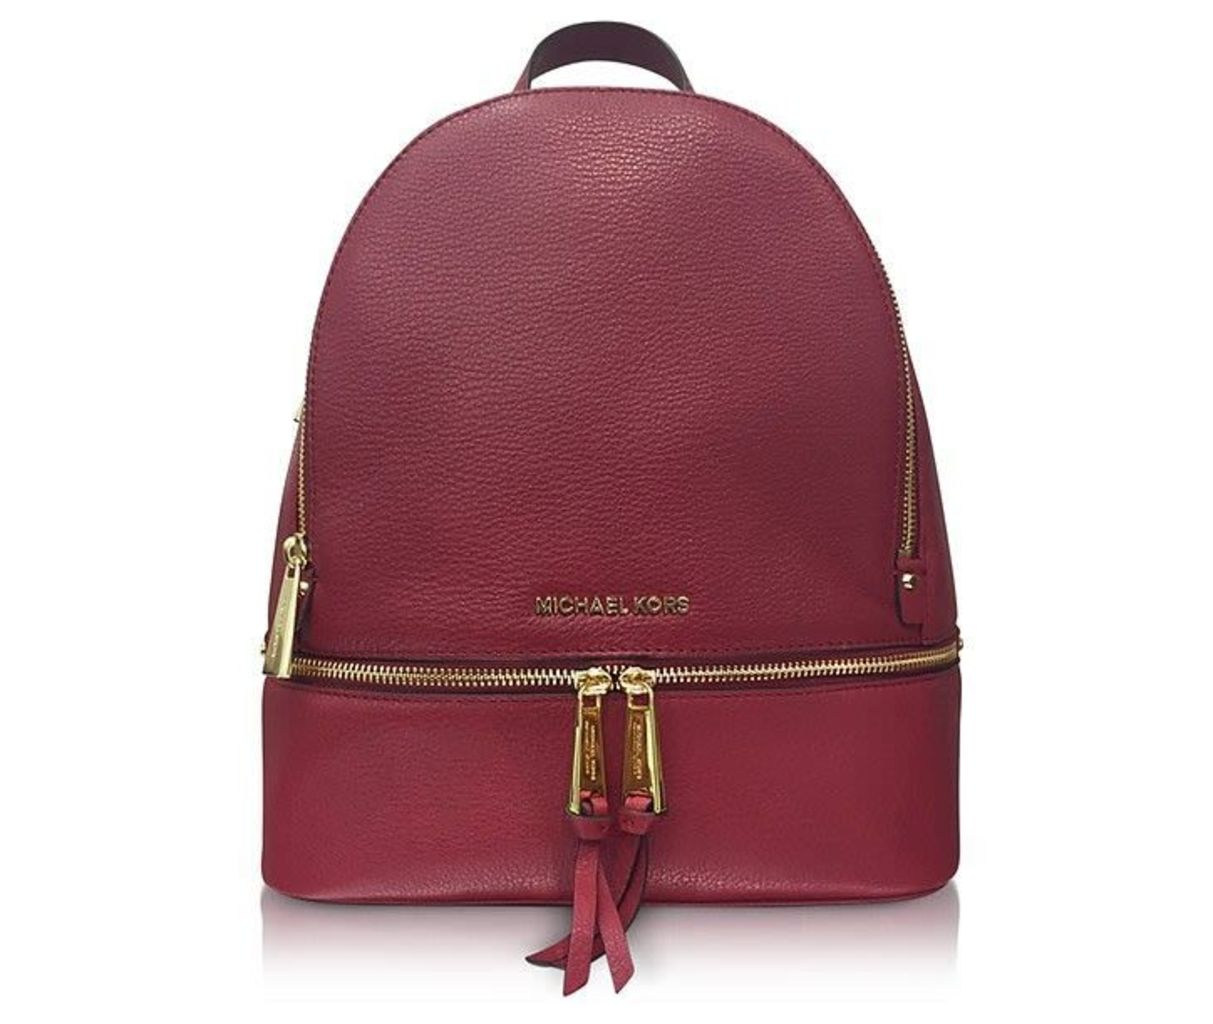 Michael Kors M Rhea Backpack